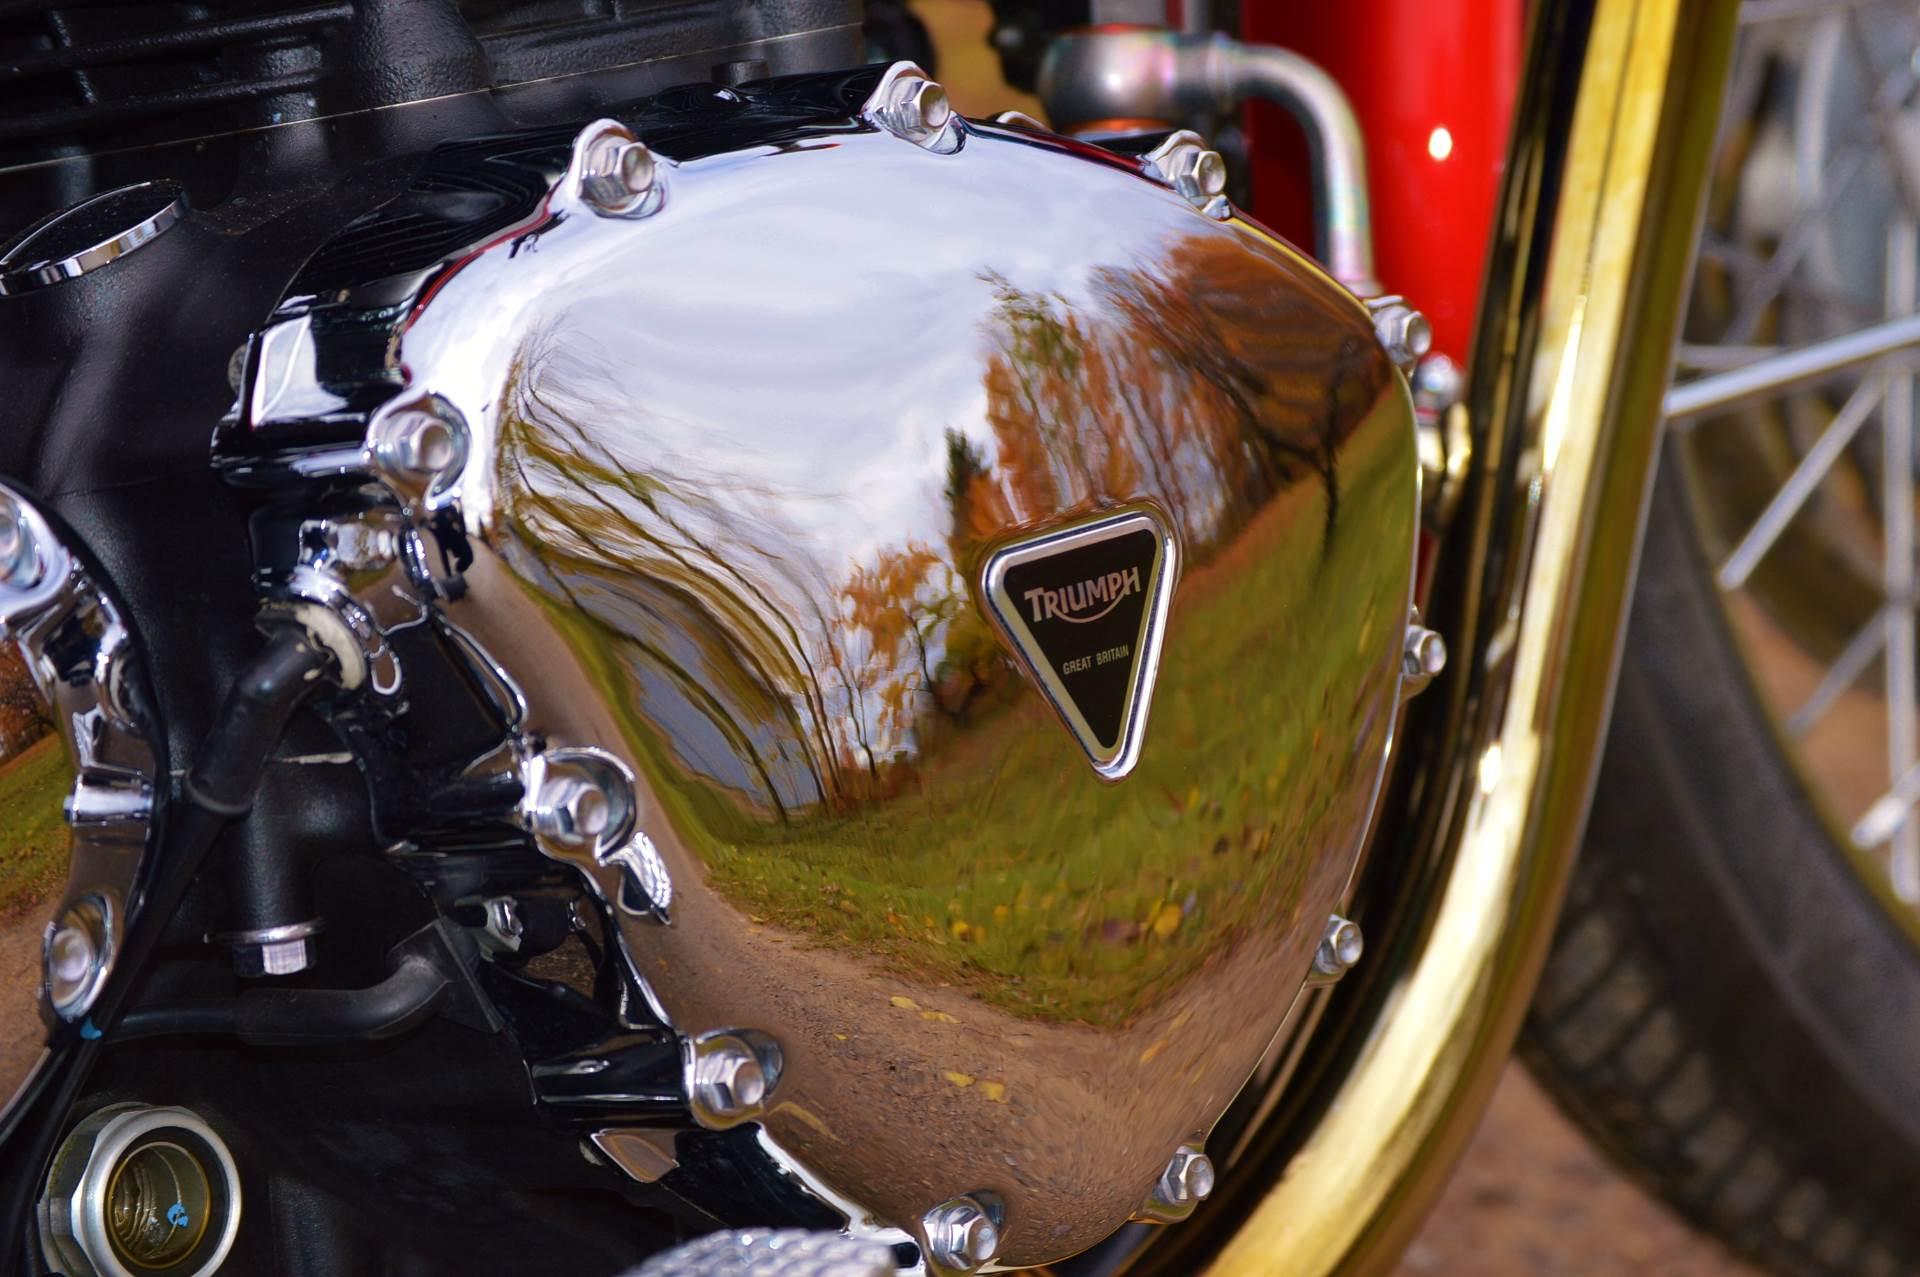 2013 Triumph Bonneville T100 in Traverse City, Michigan